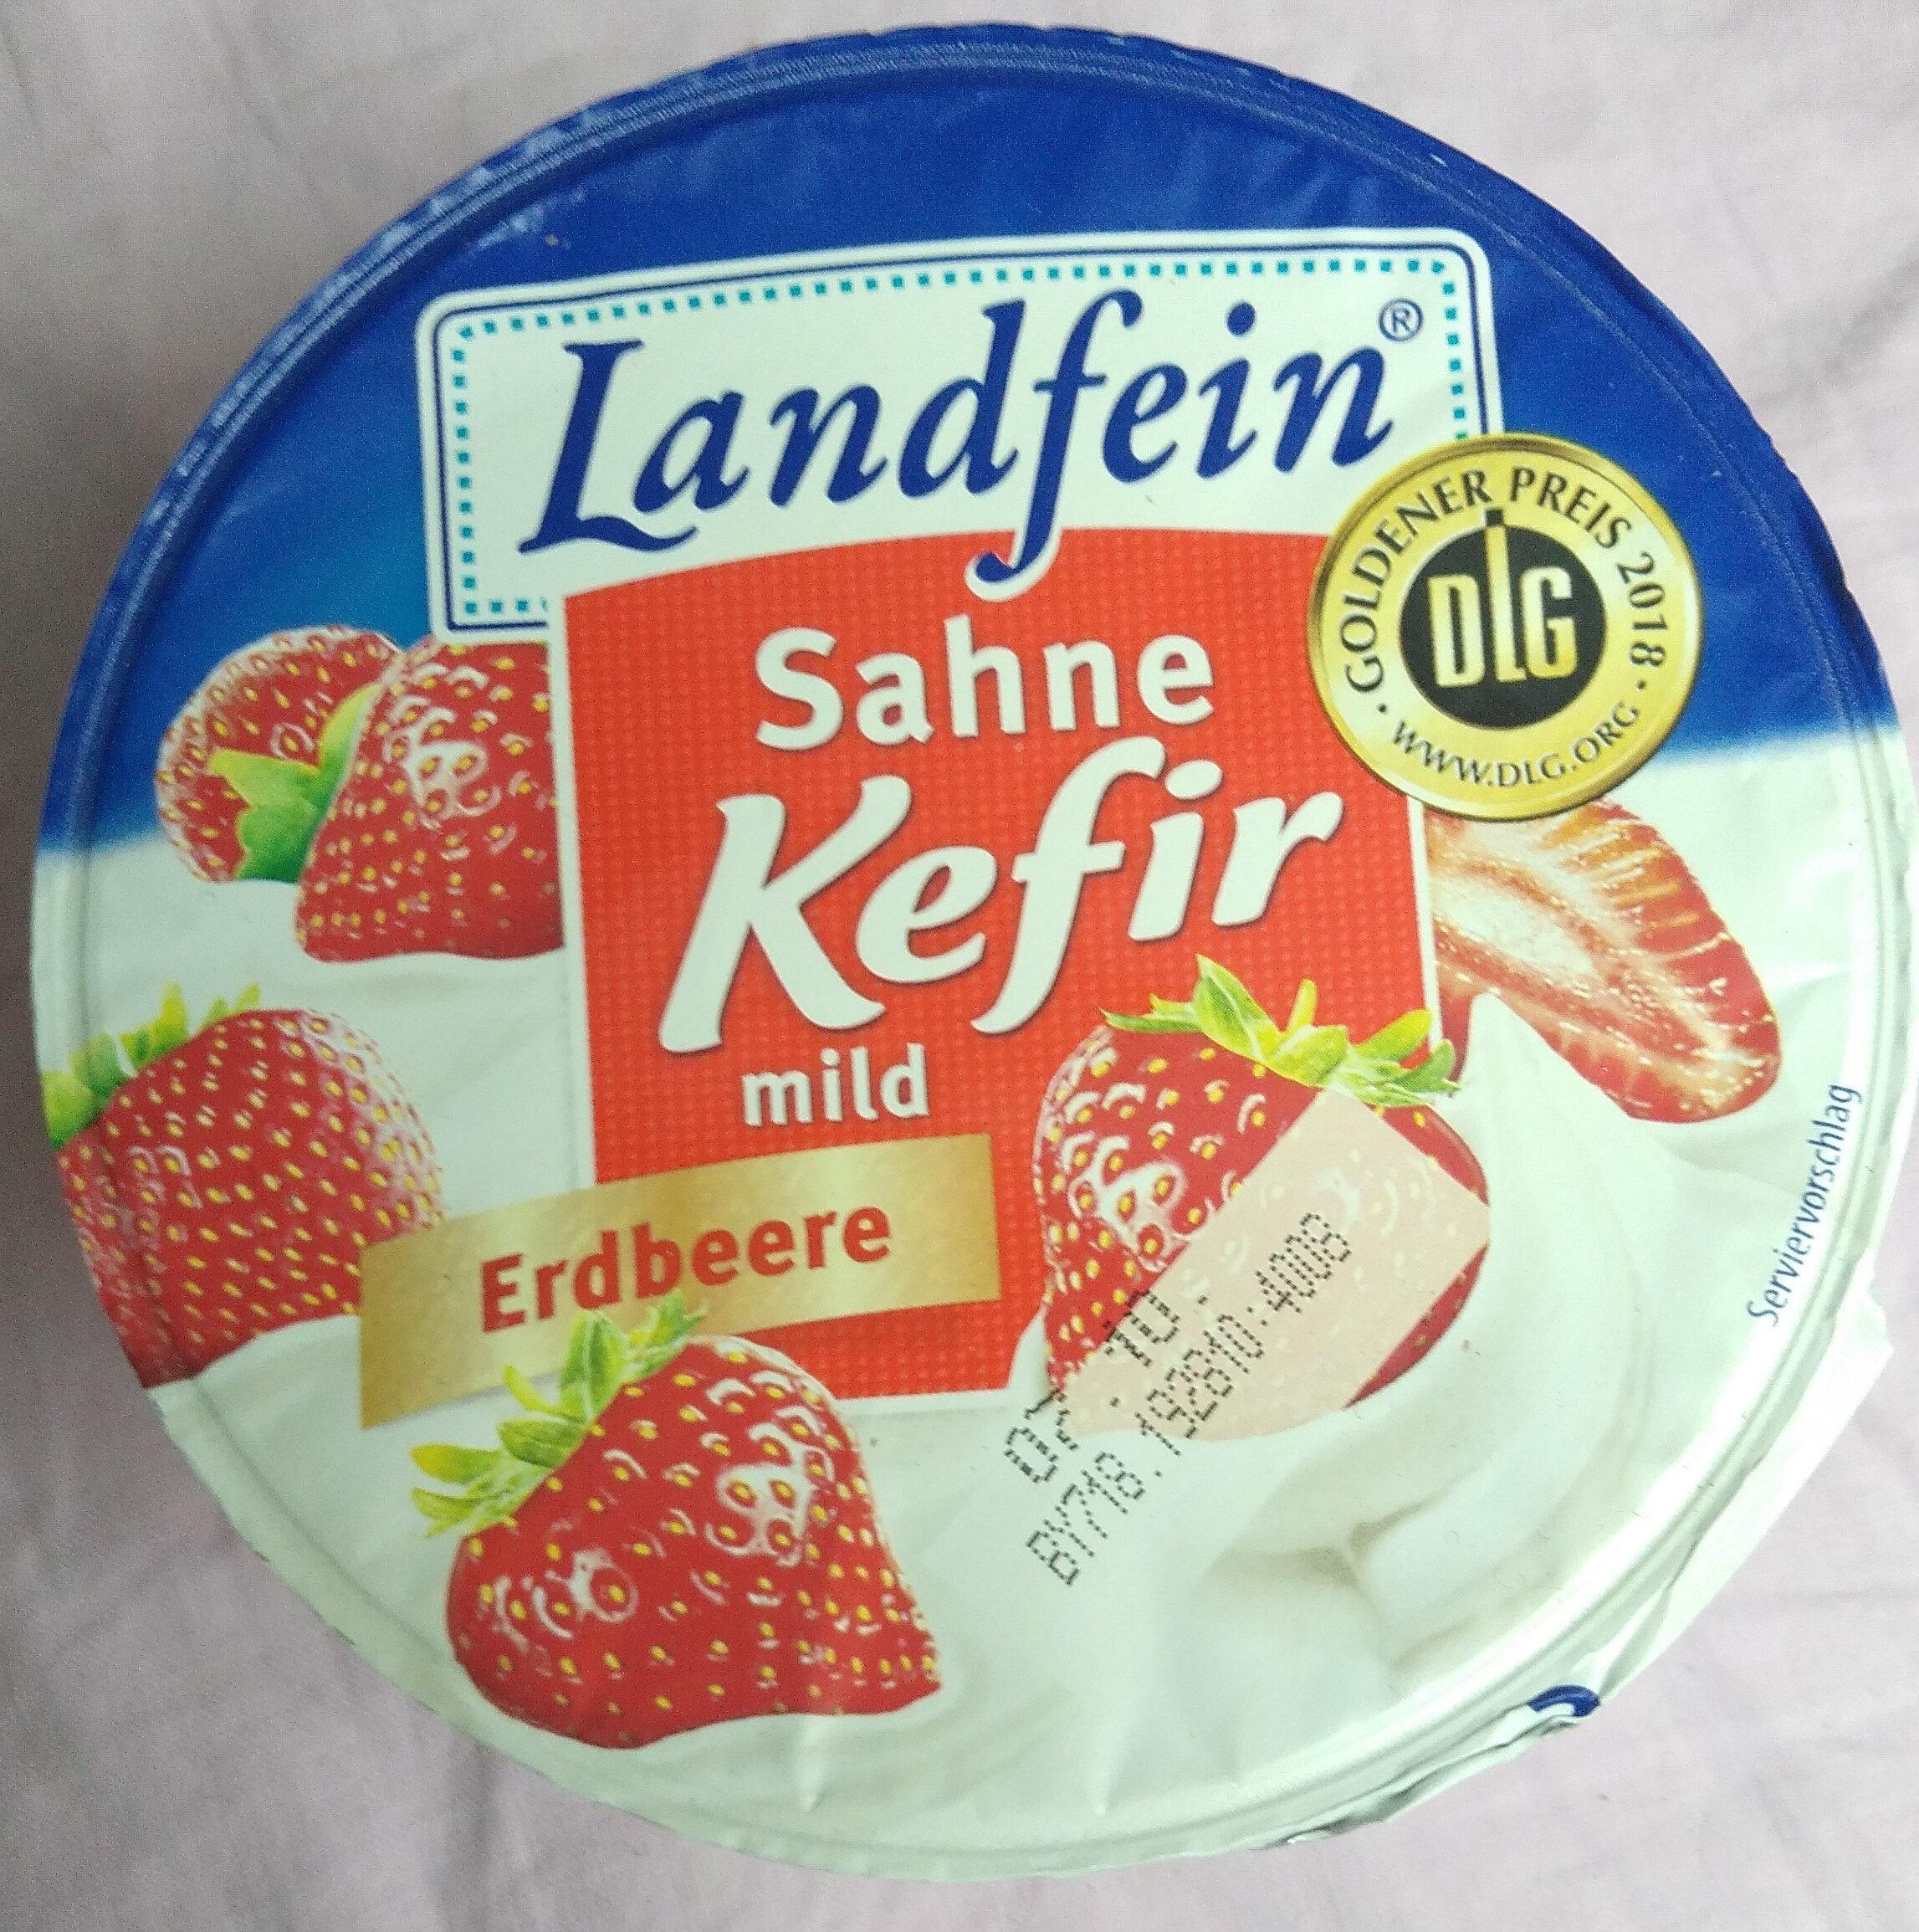 Sahne Kefir mild Erdbeere - Product - de